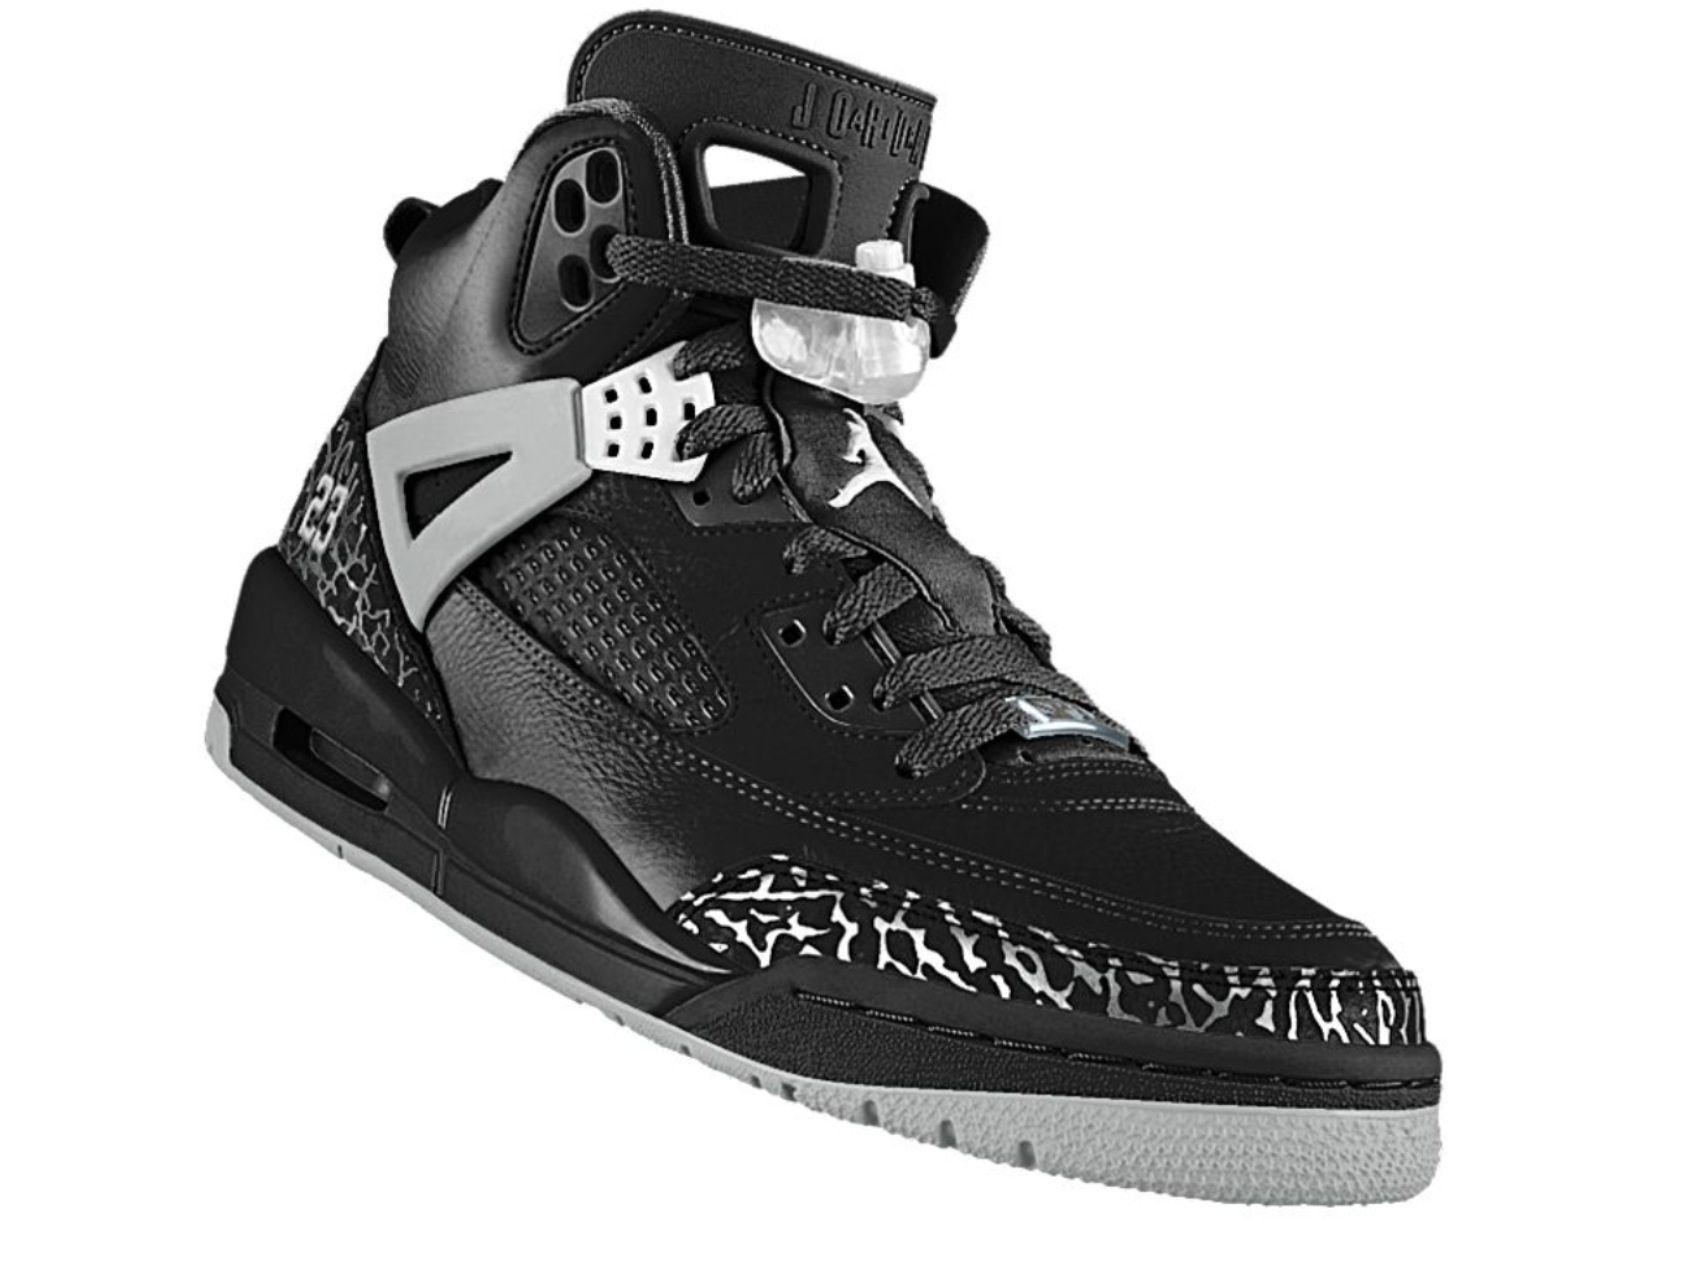 8aac1639178 NikeID Jordan Spizike (My Design)  Nikeid  Jordans  Spizike  Black  Cement